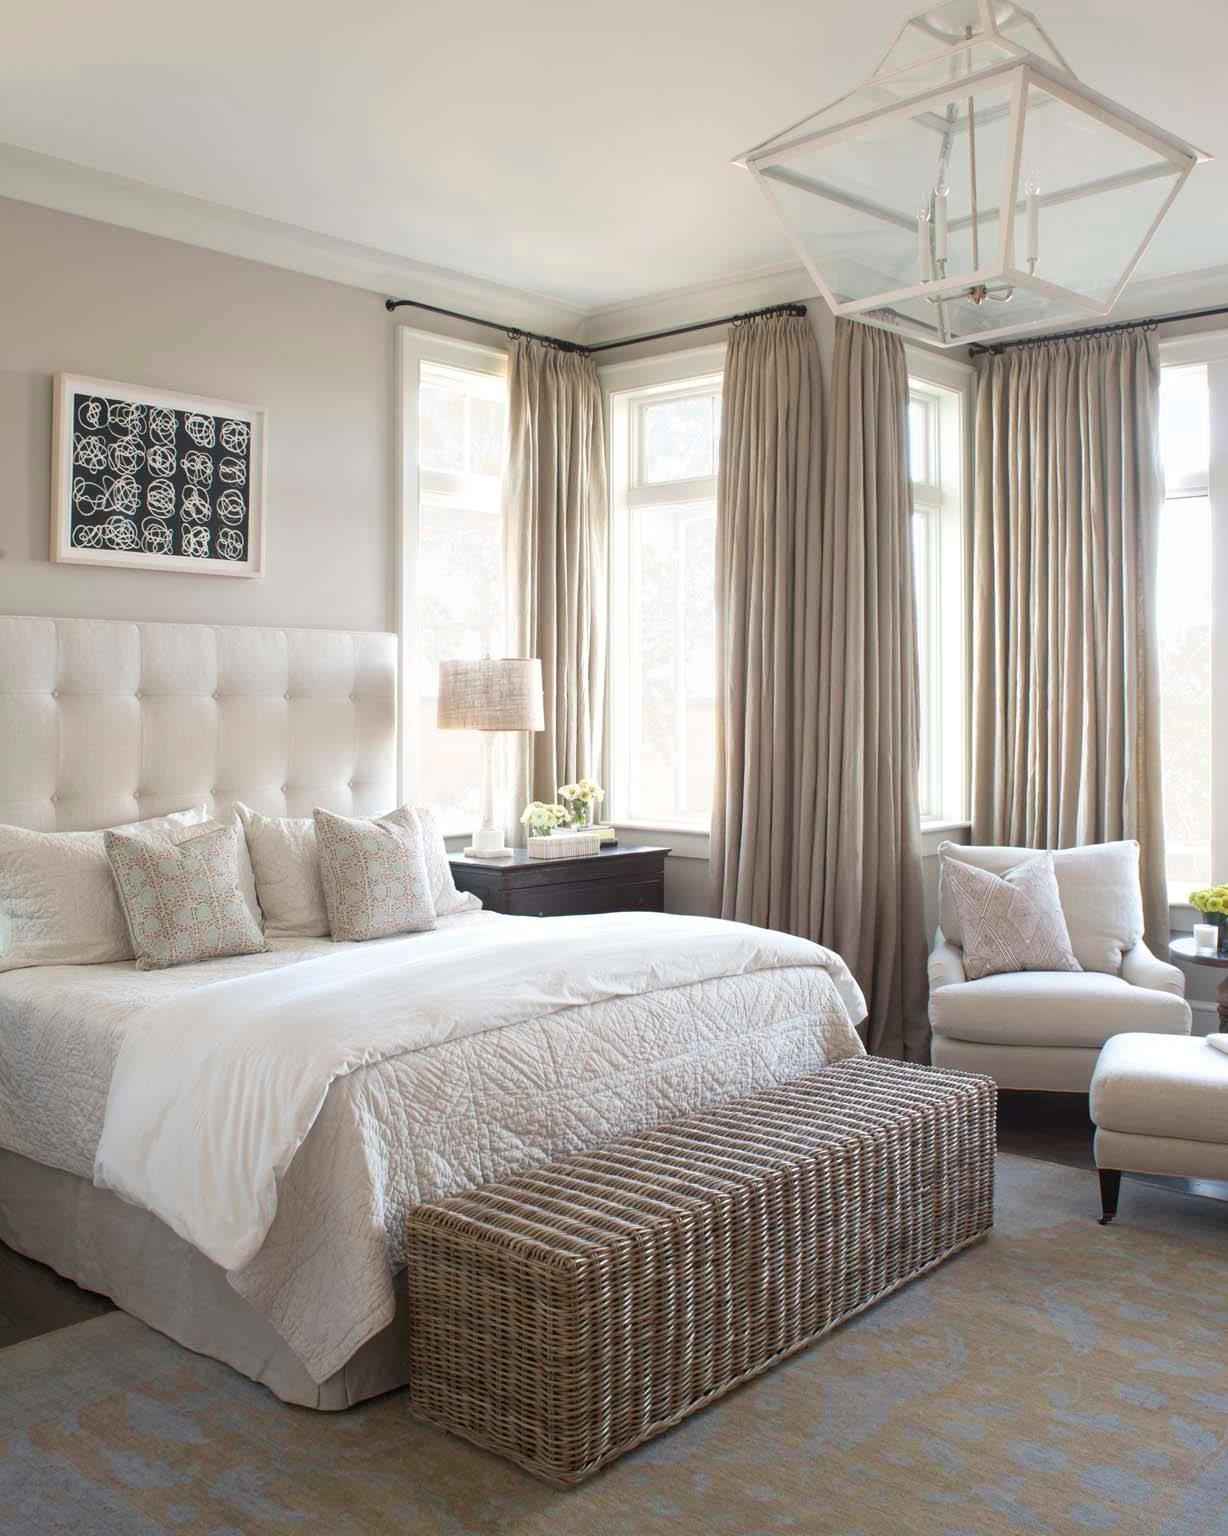 75 Beautiful Beige Bedroom Pictures Ideas February 2021 Houzz